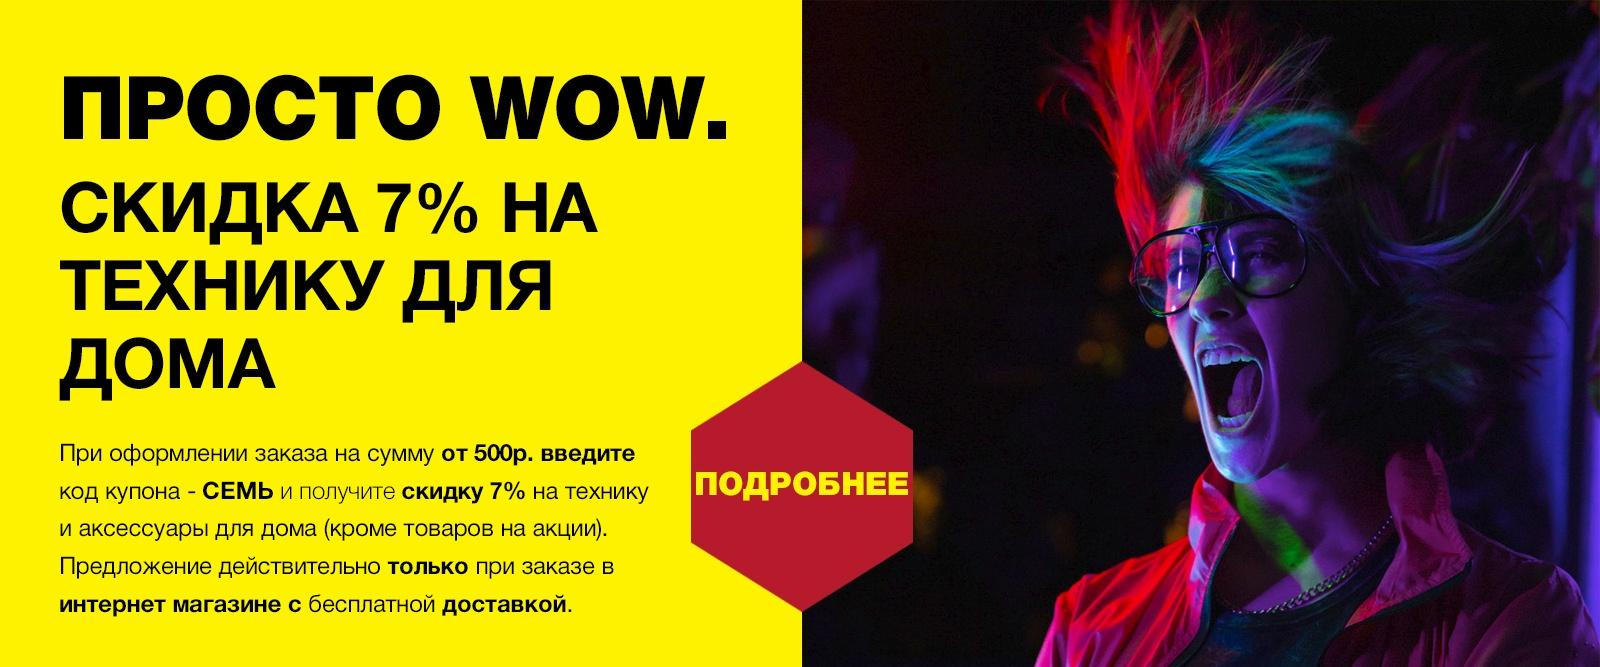 Скидка 7% на технику для дома от 500 рублей